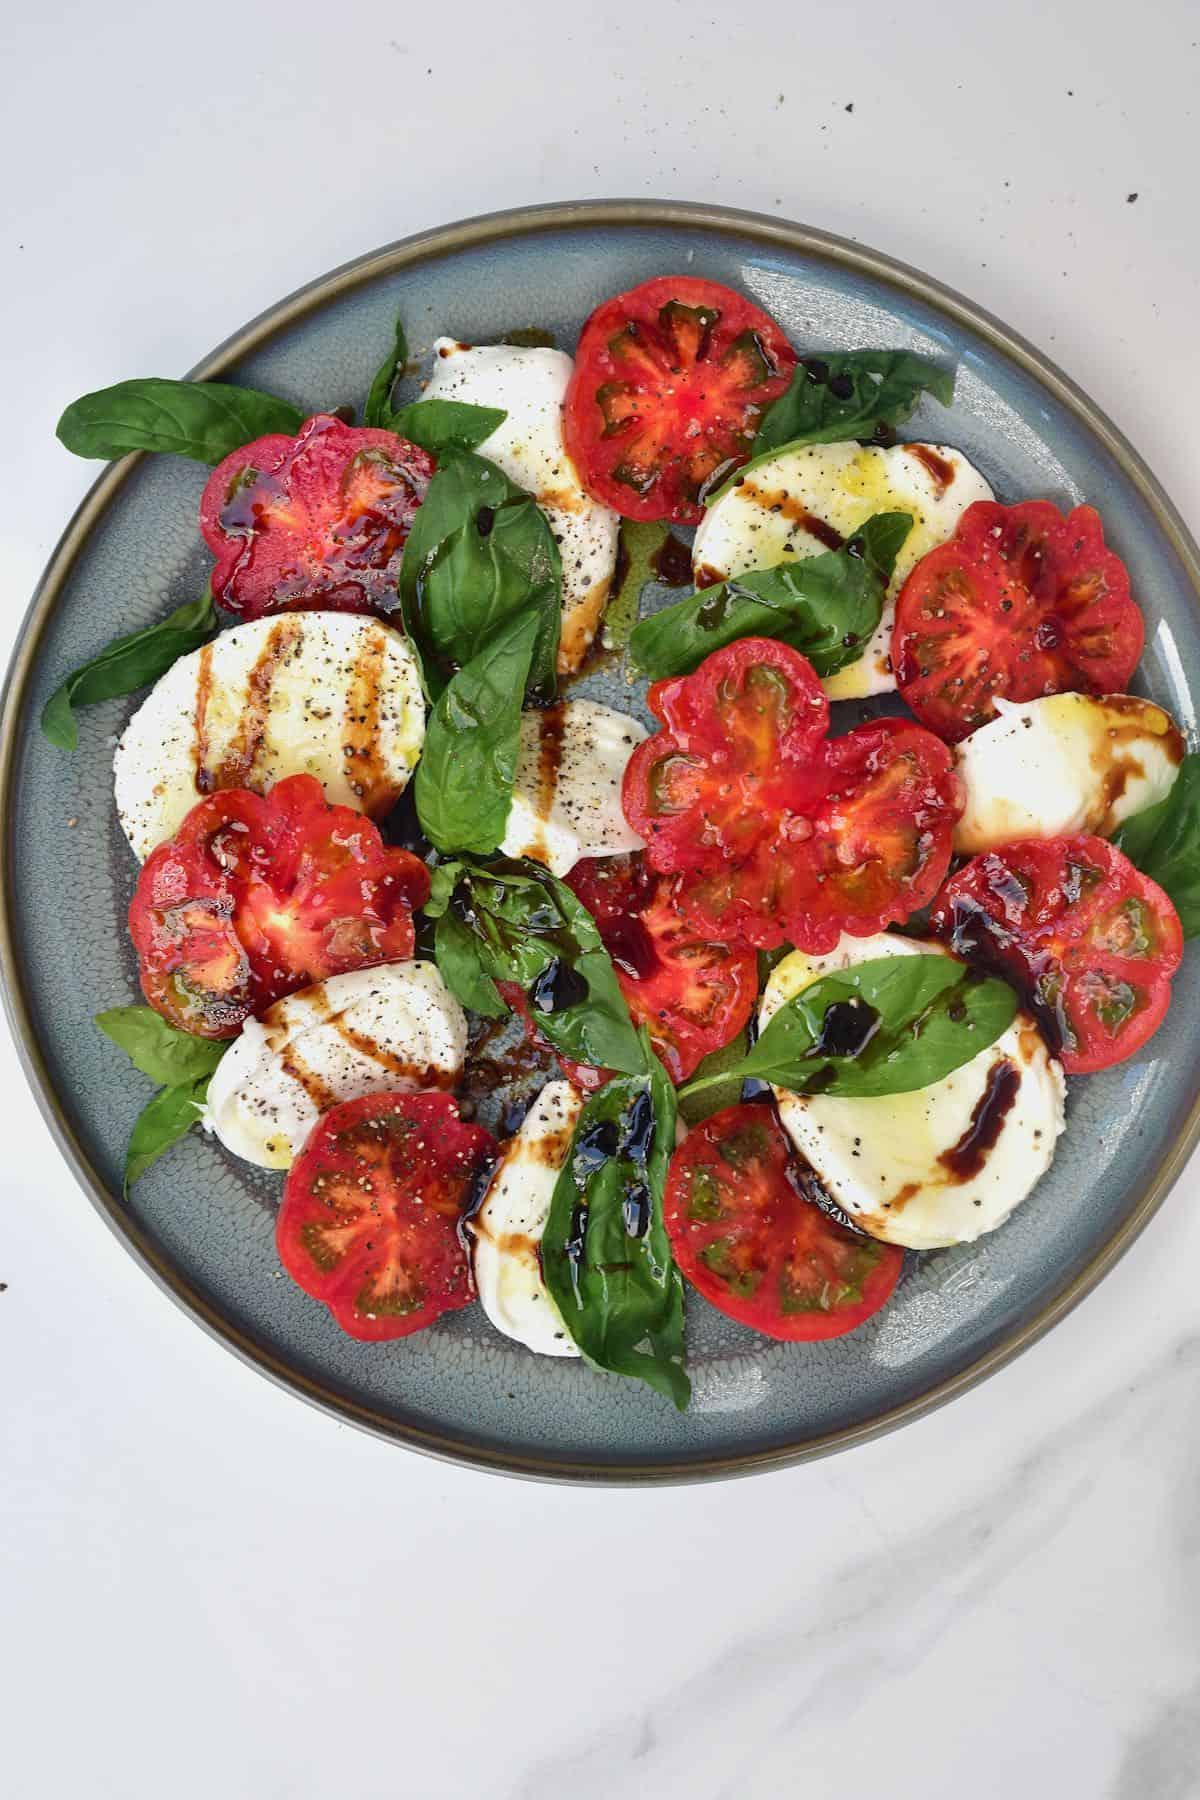 Caprese salad in a plate